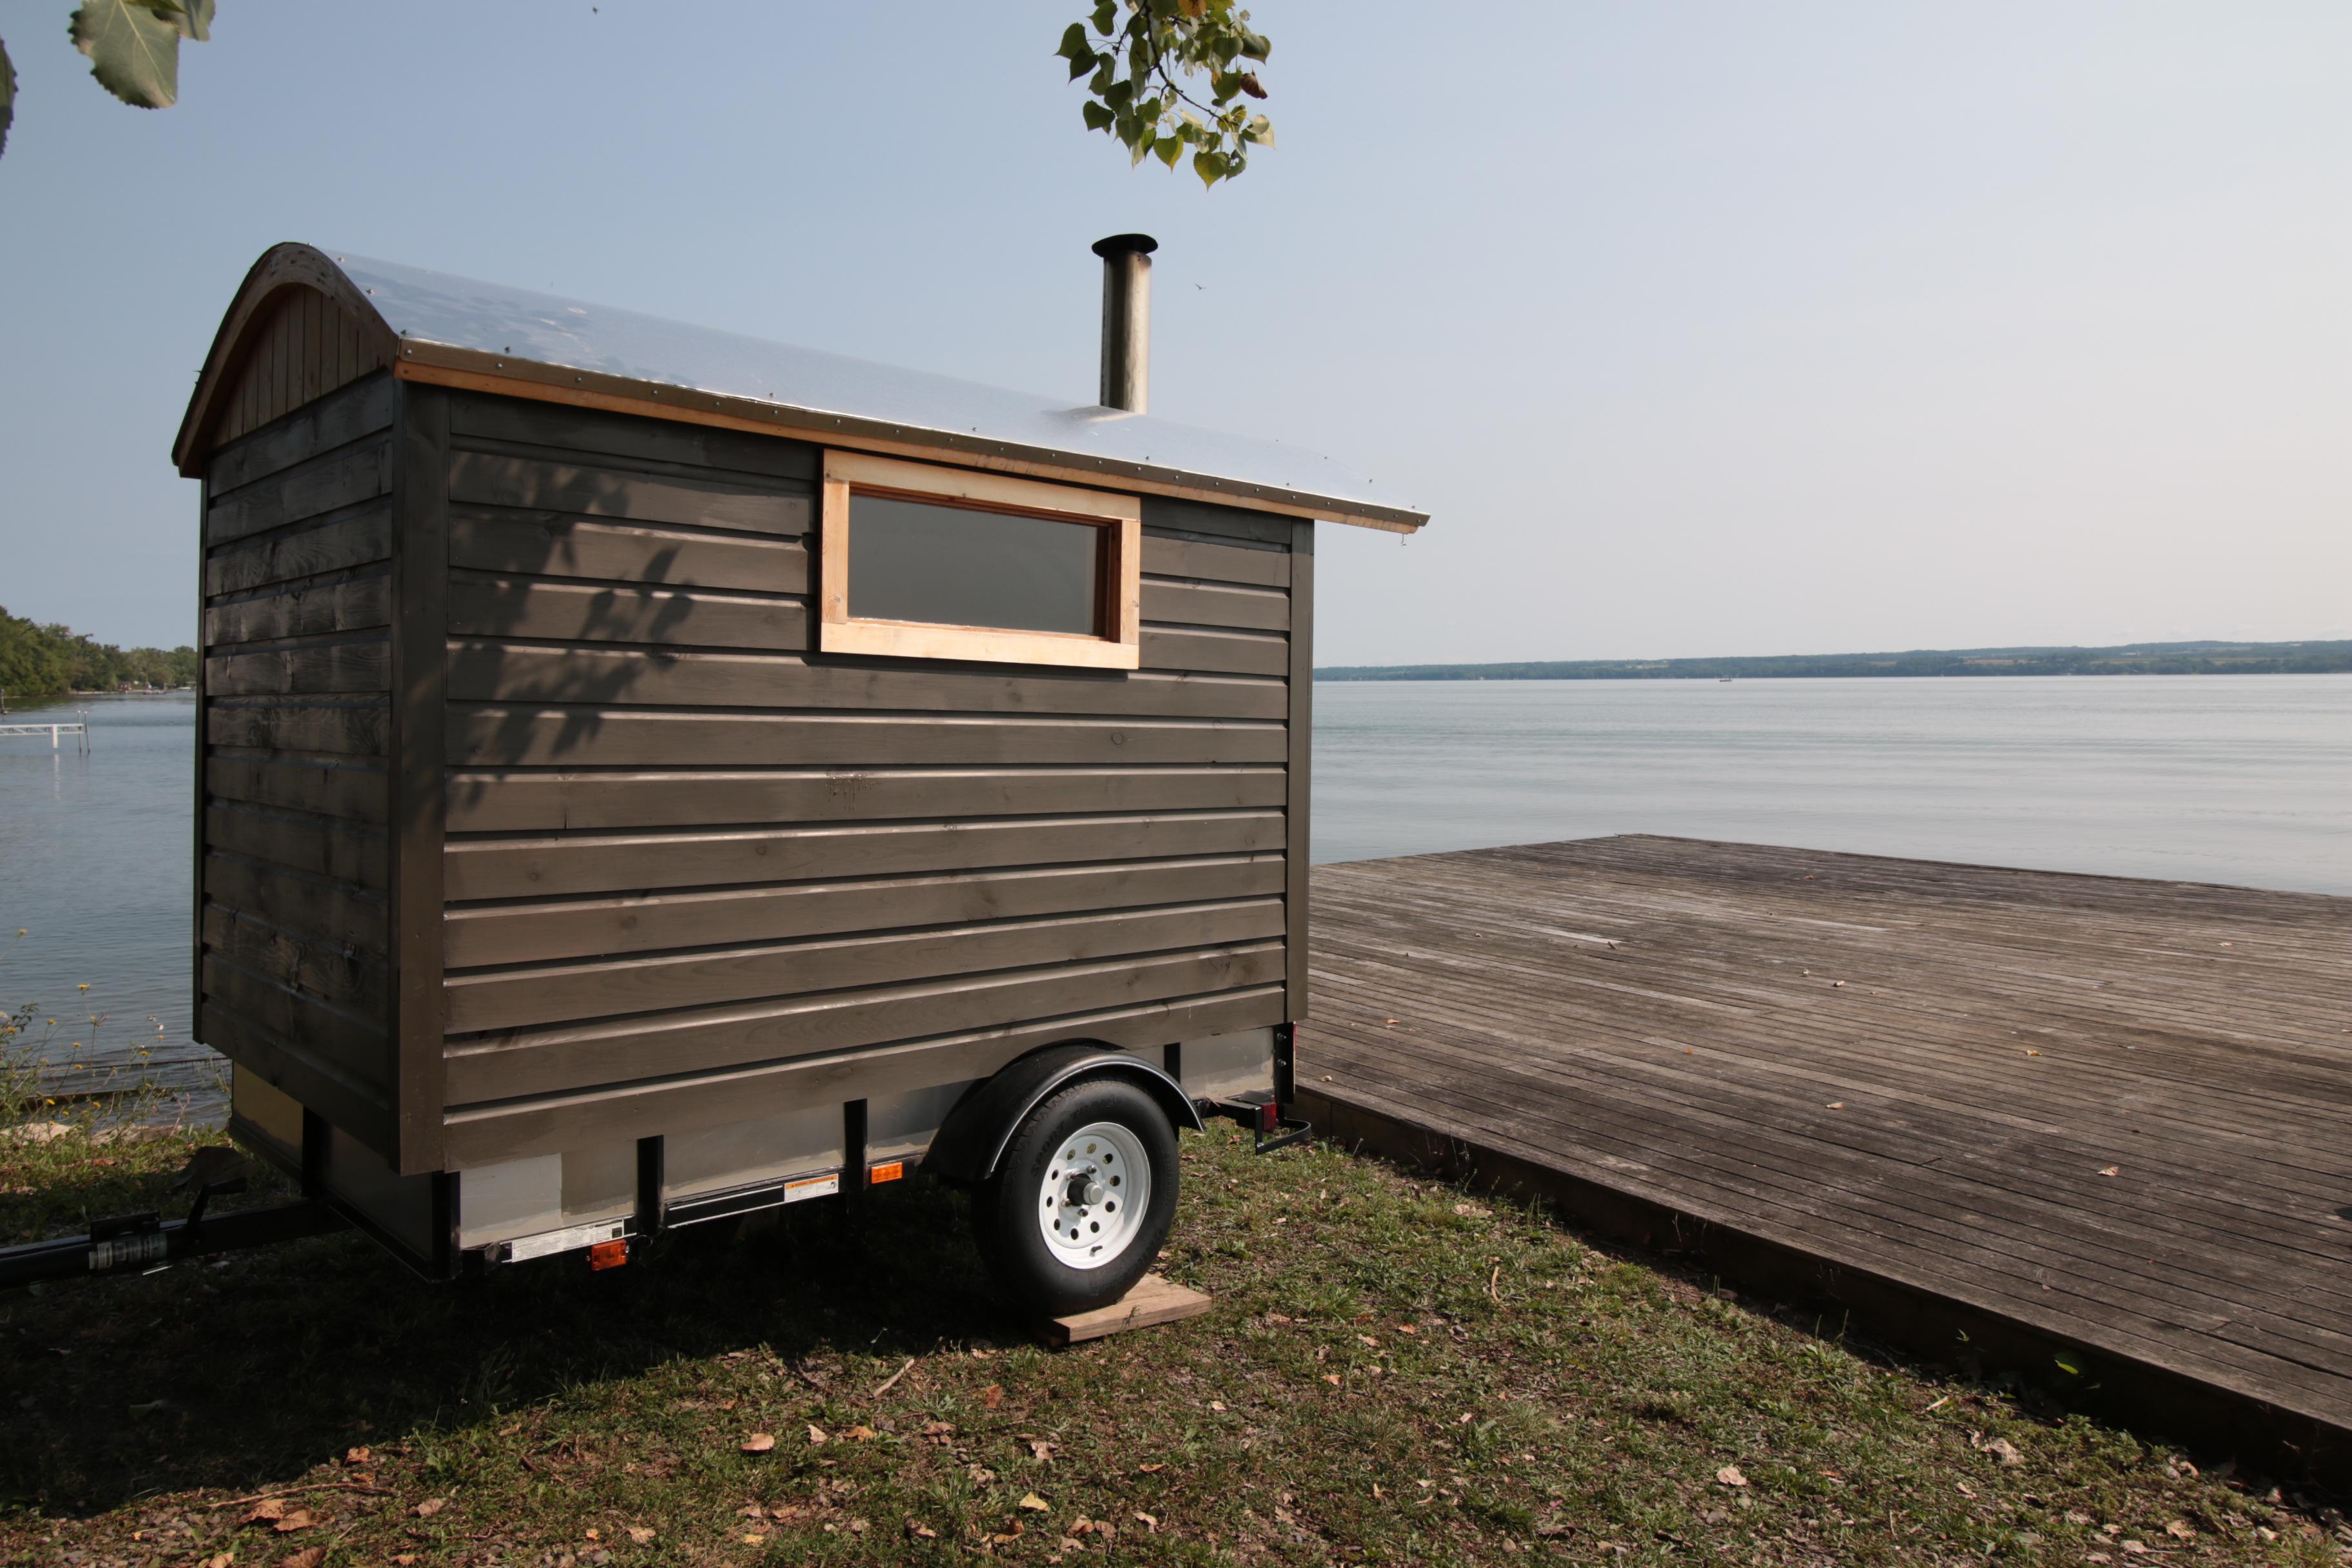 Rob Licht Custom Saunas Mobile Saunas